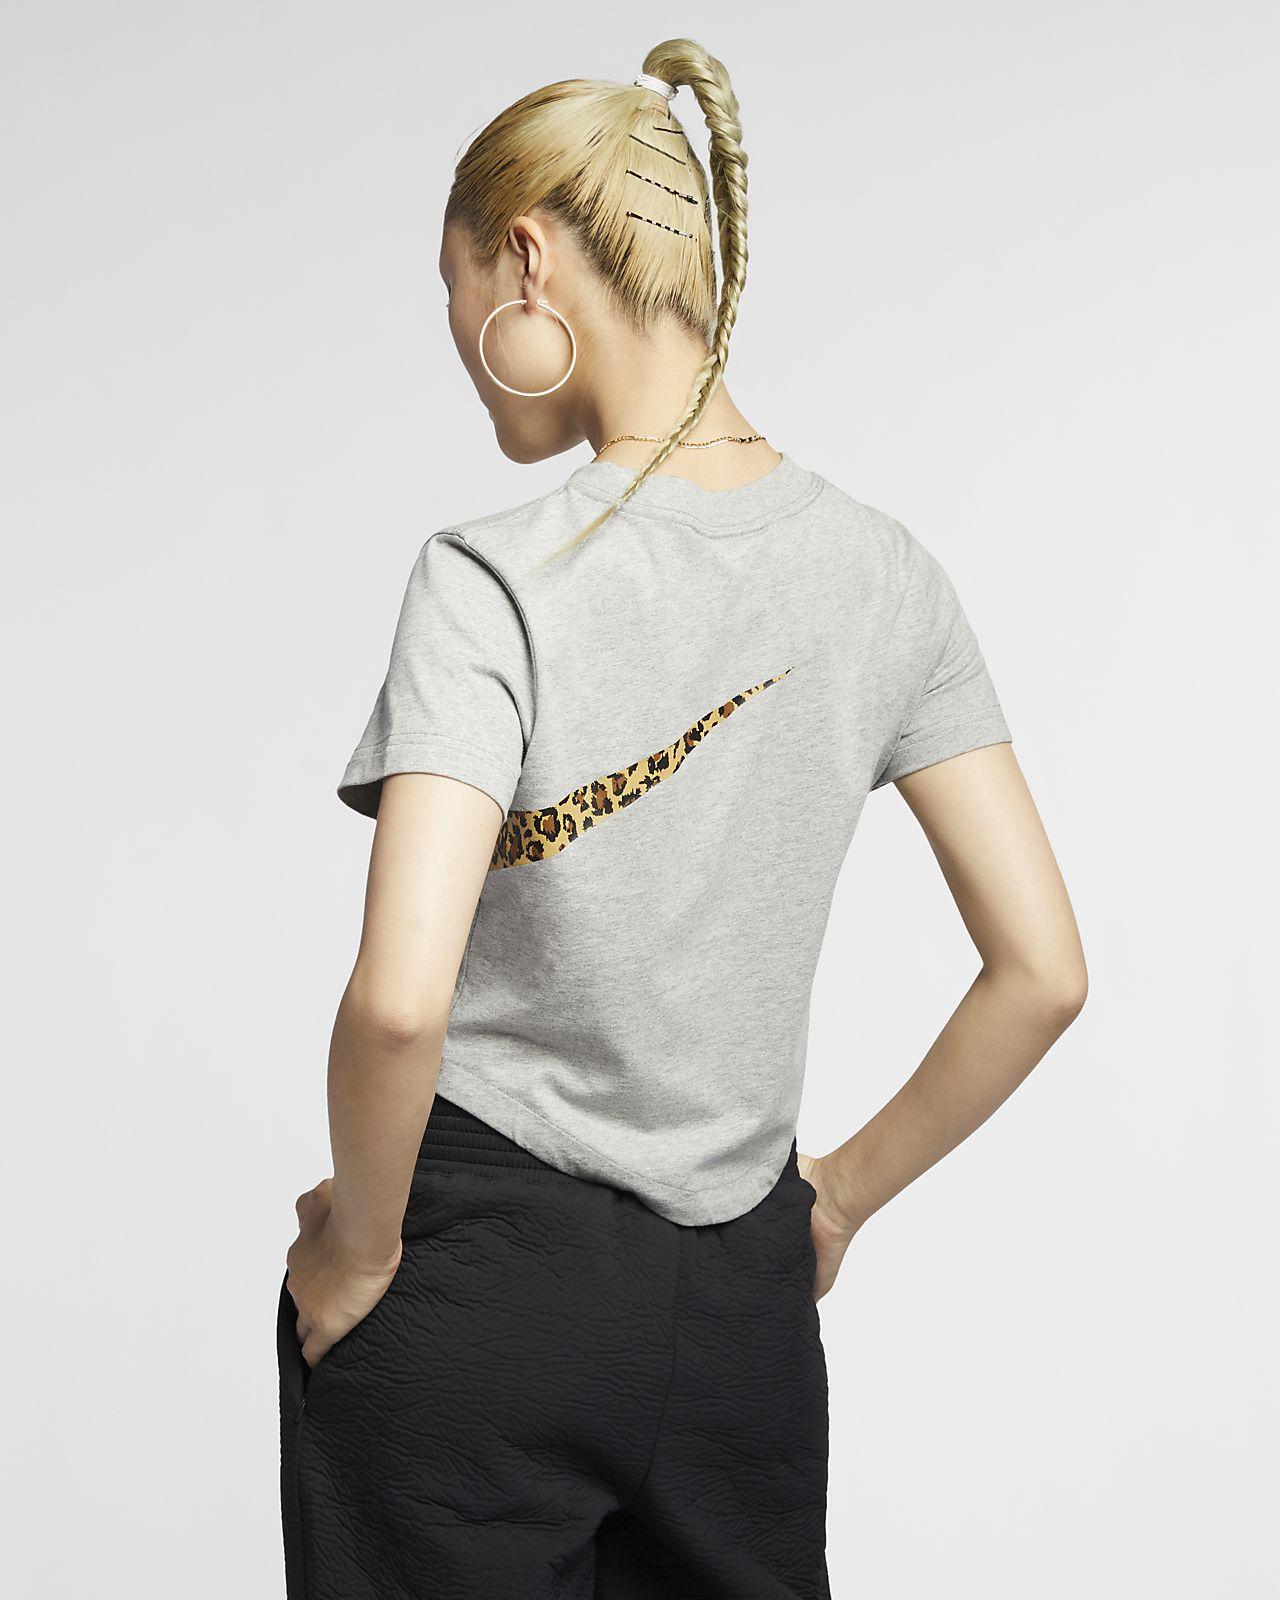 2ea0e4204e95f Nike Sportswear Women's Animal Cropped Top. Nike.com